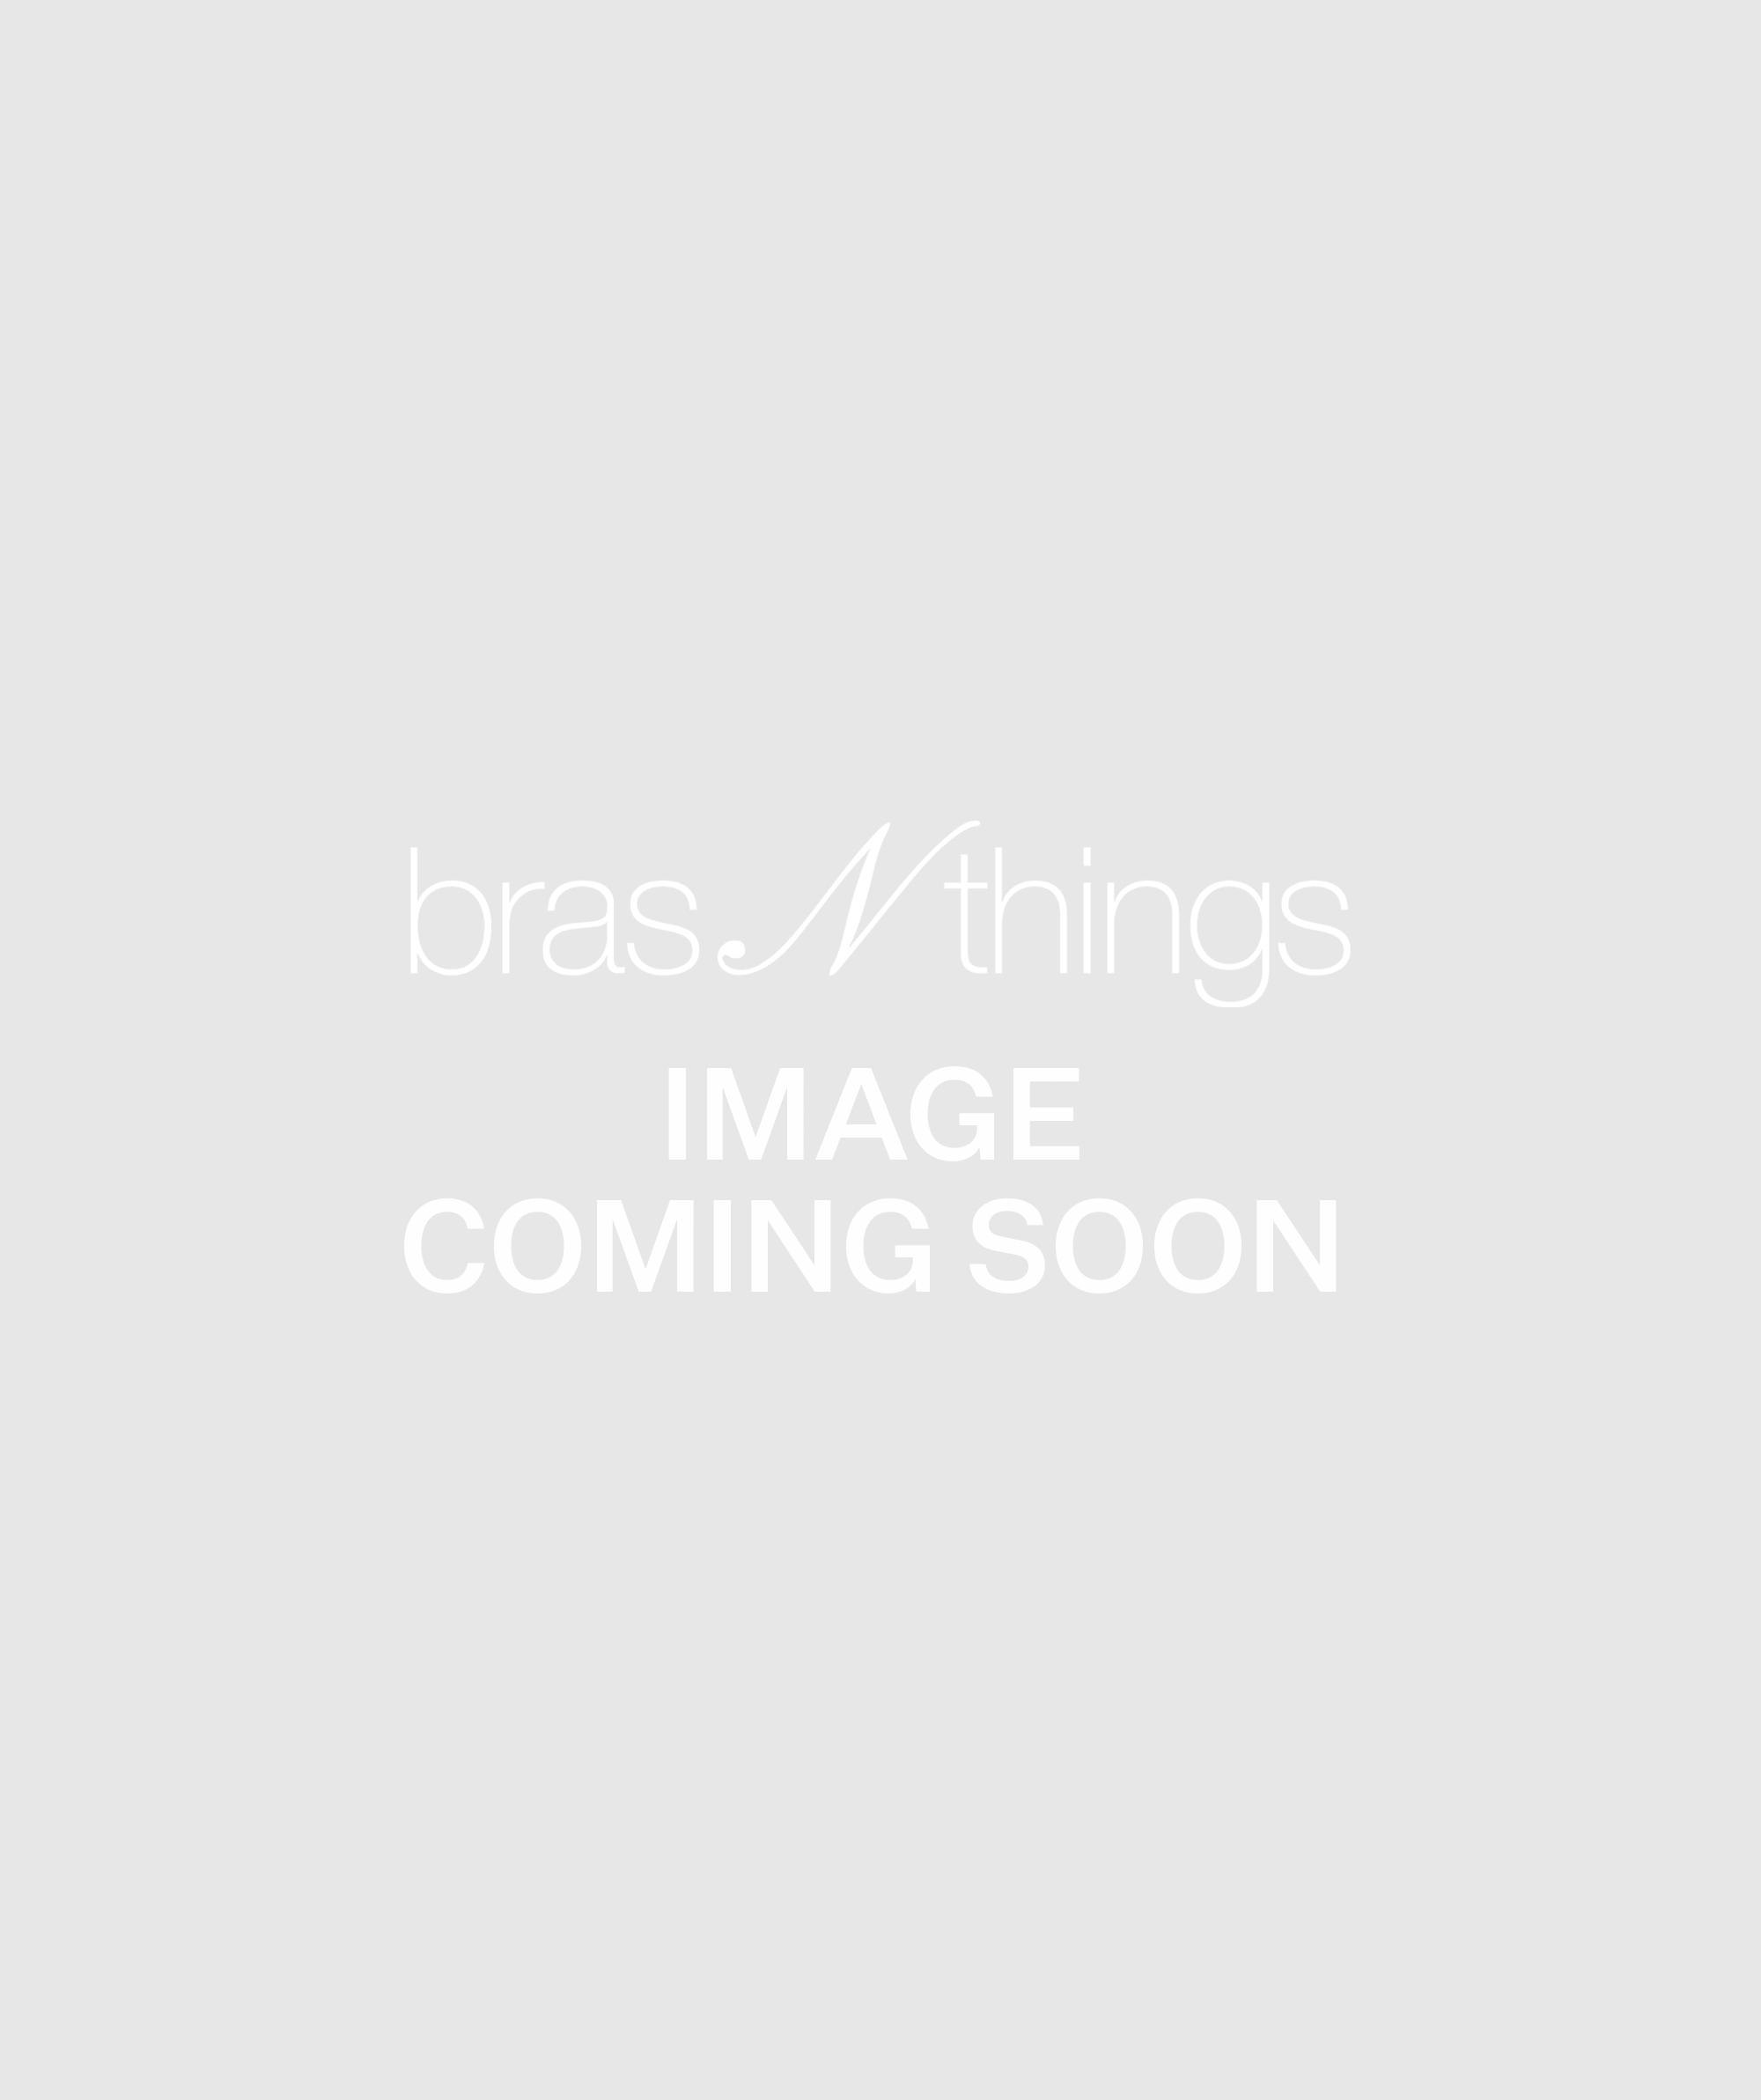 Body Bliss Luxe Full Cup Bra - Black/Nude